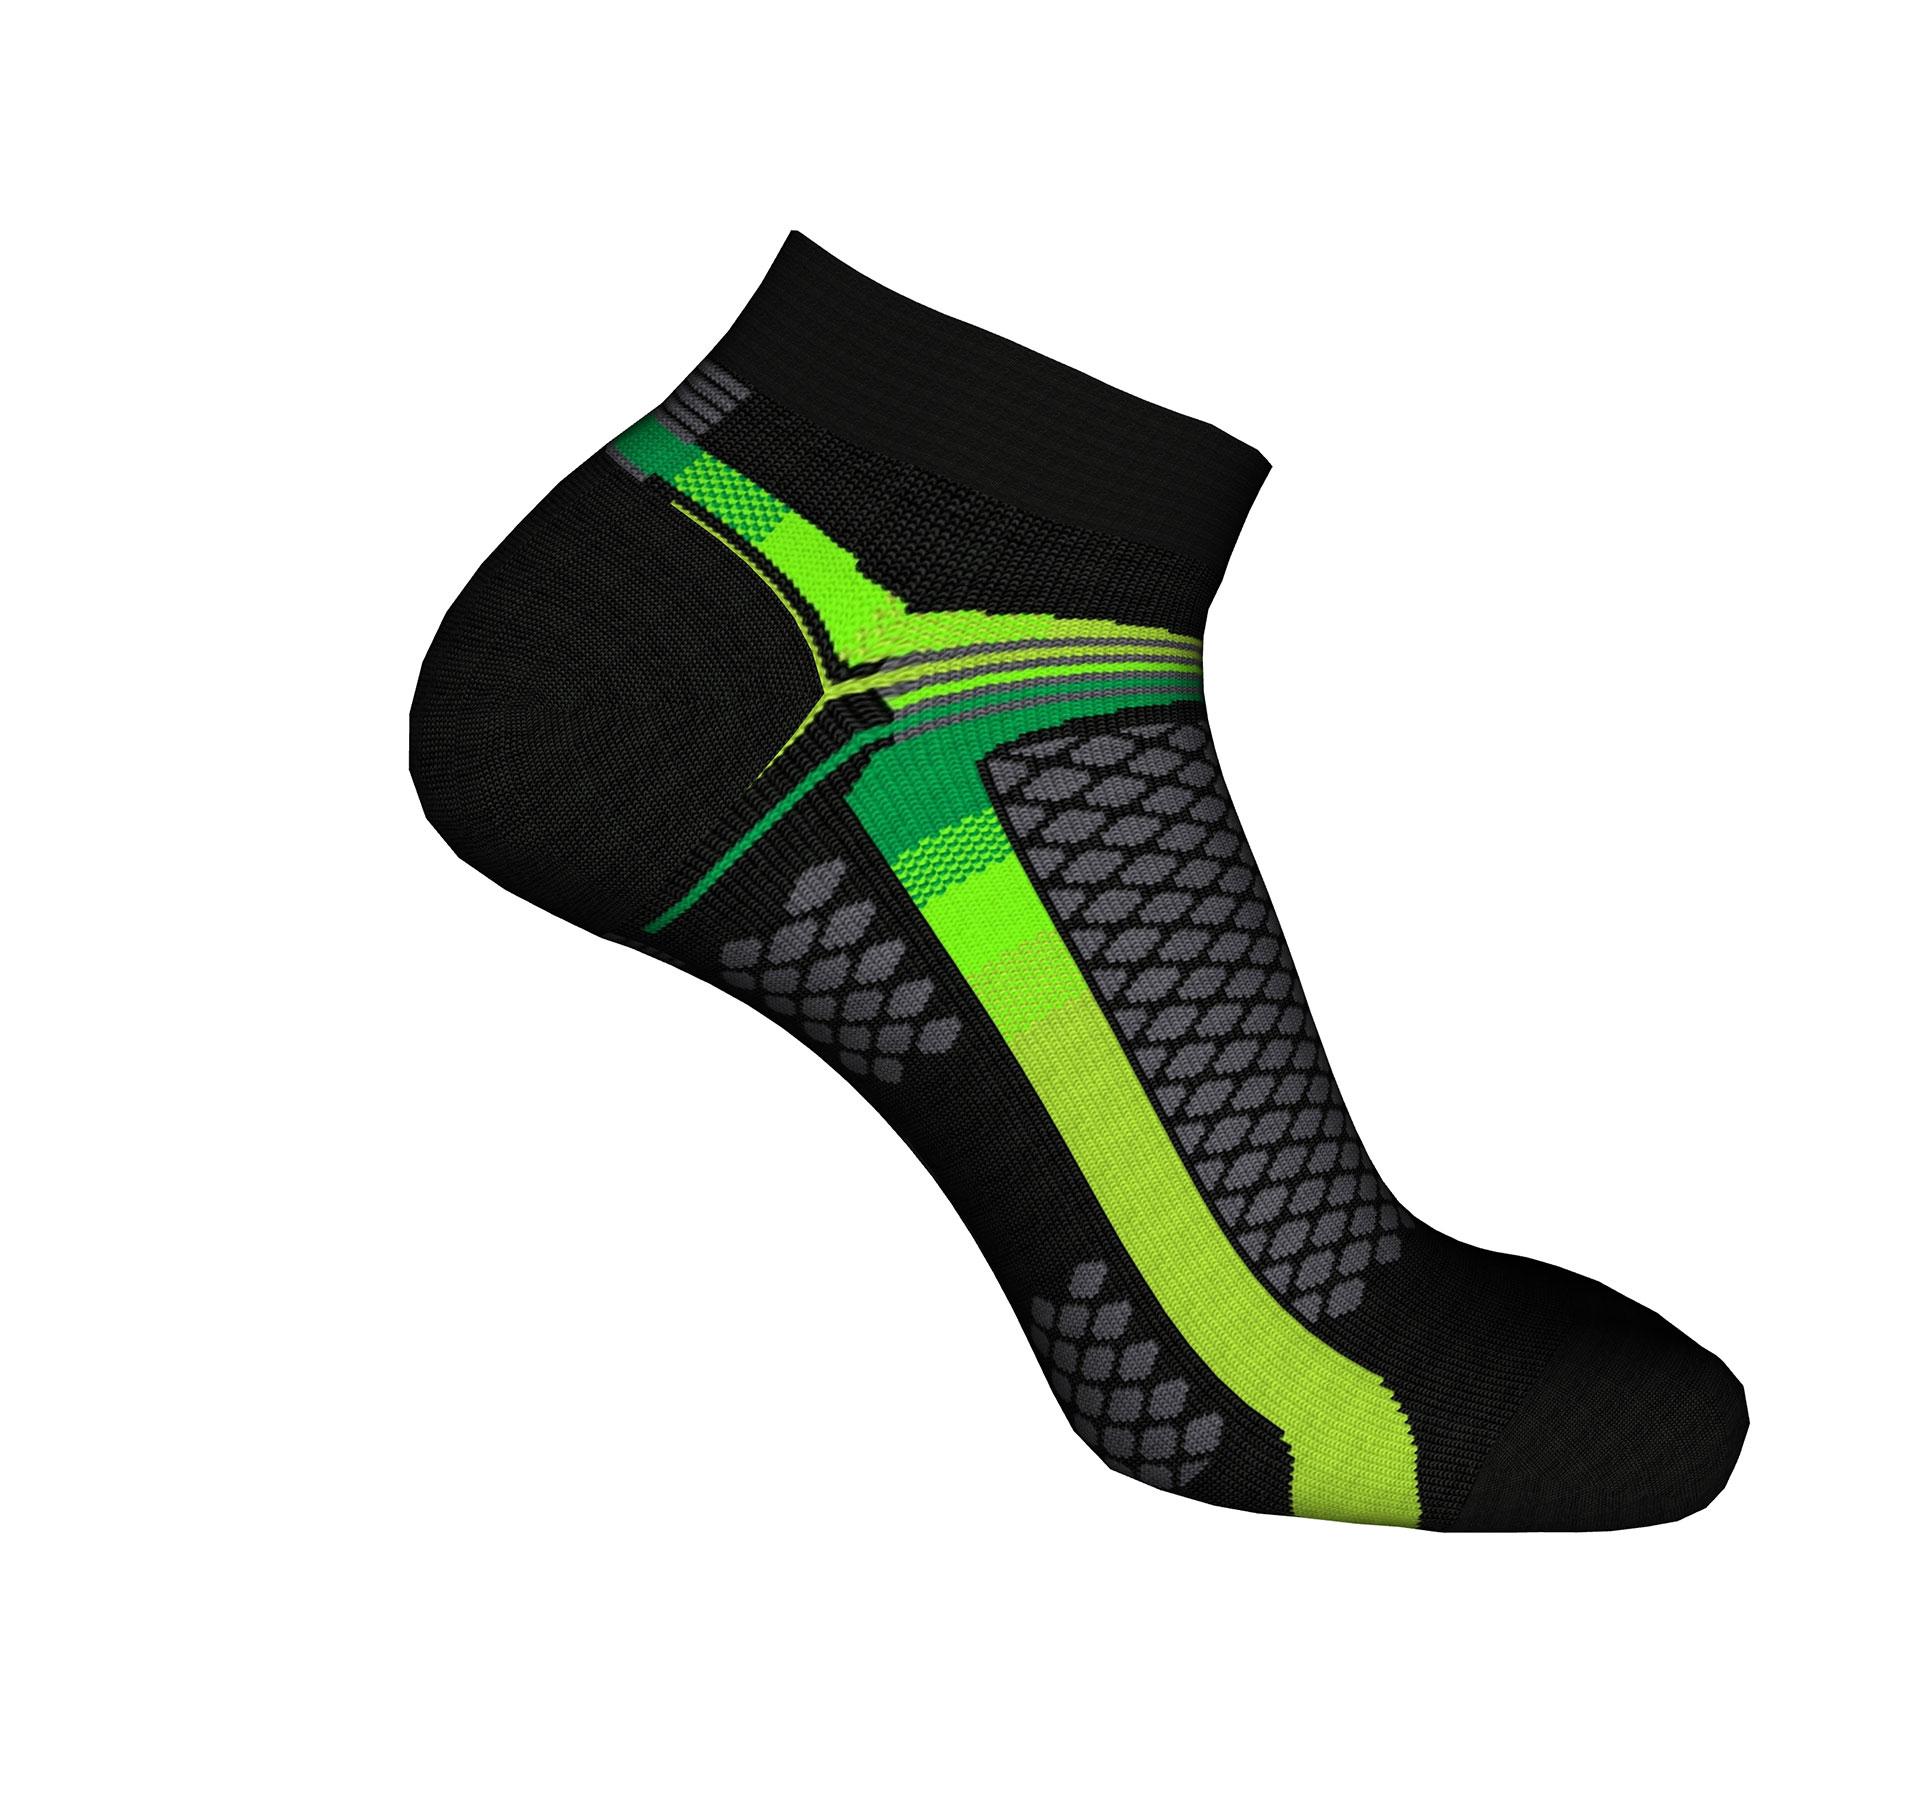 Produzione e vendita calze da running e podismo beneduci - Calze per piscina ...